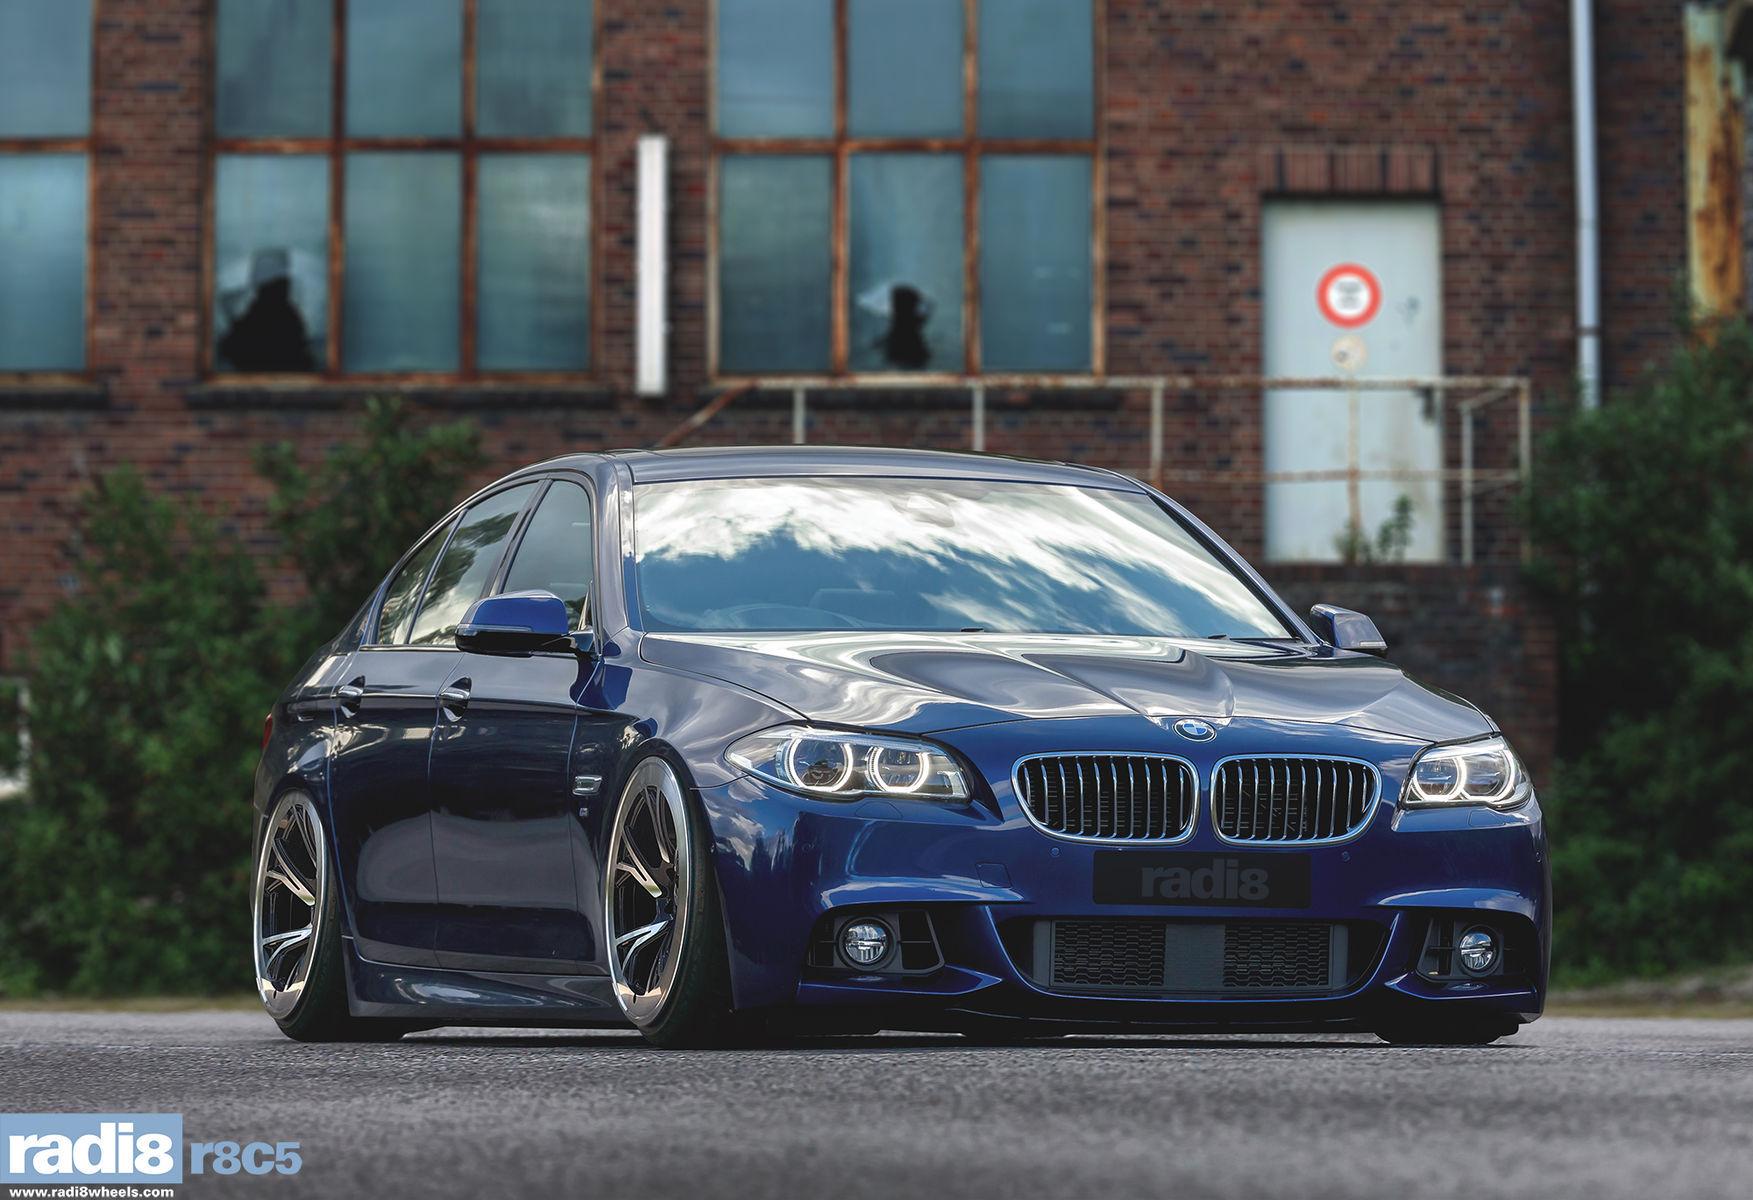 Radi8 R8C5 BMW 535i M sport